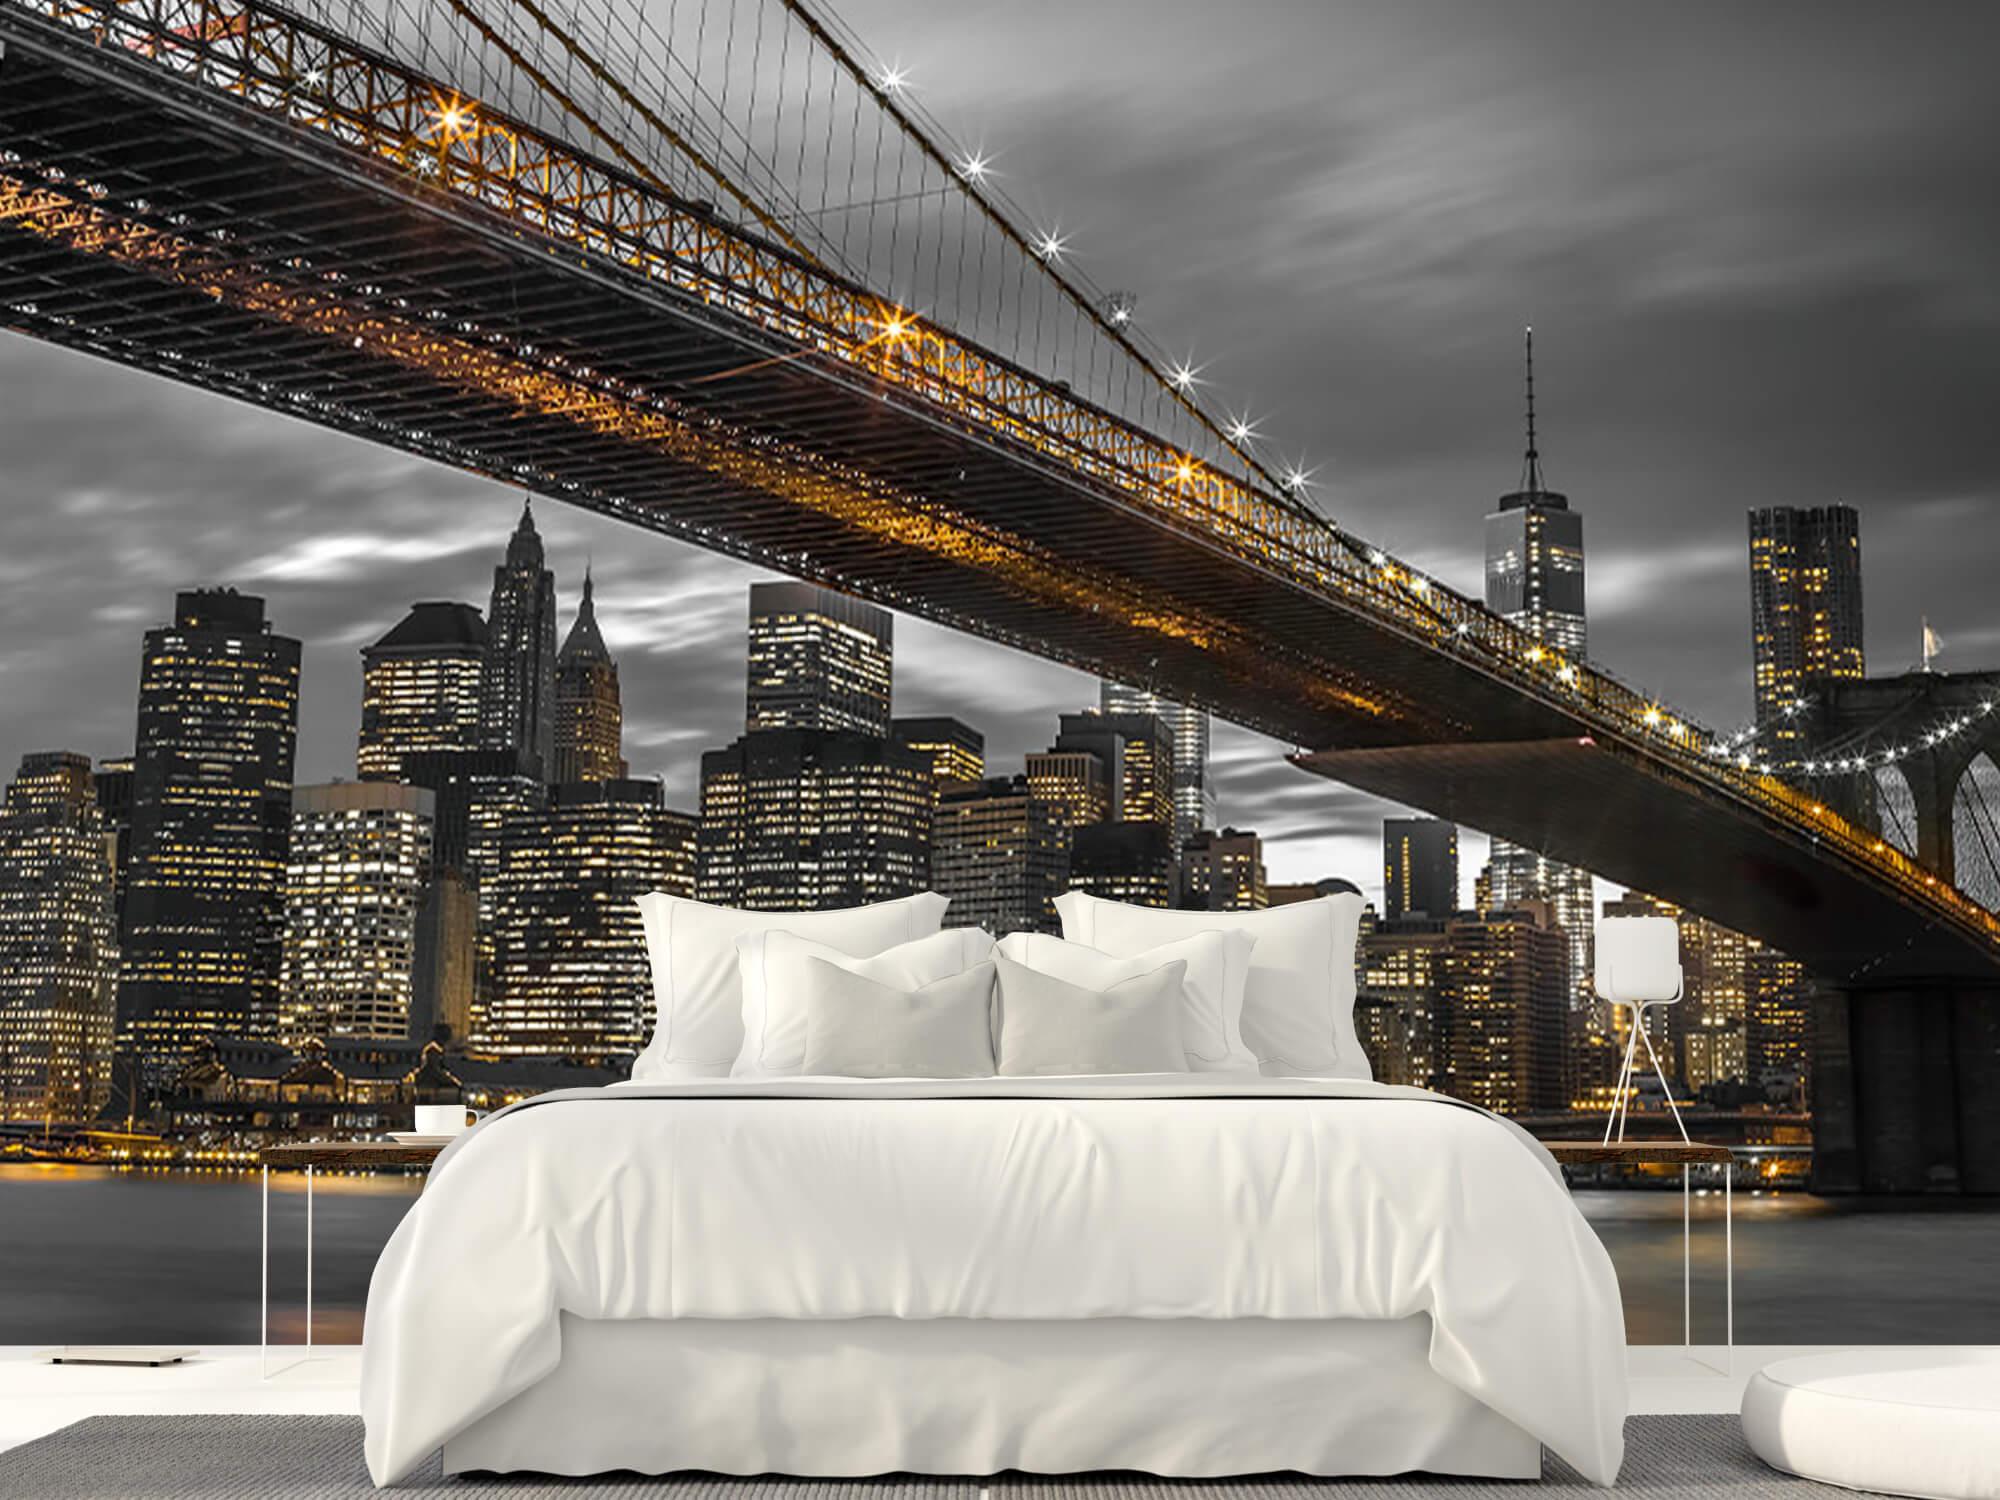 Pont de Brooklyn, New York 19